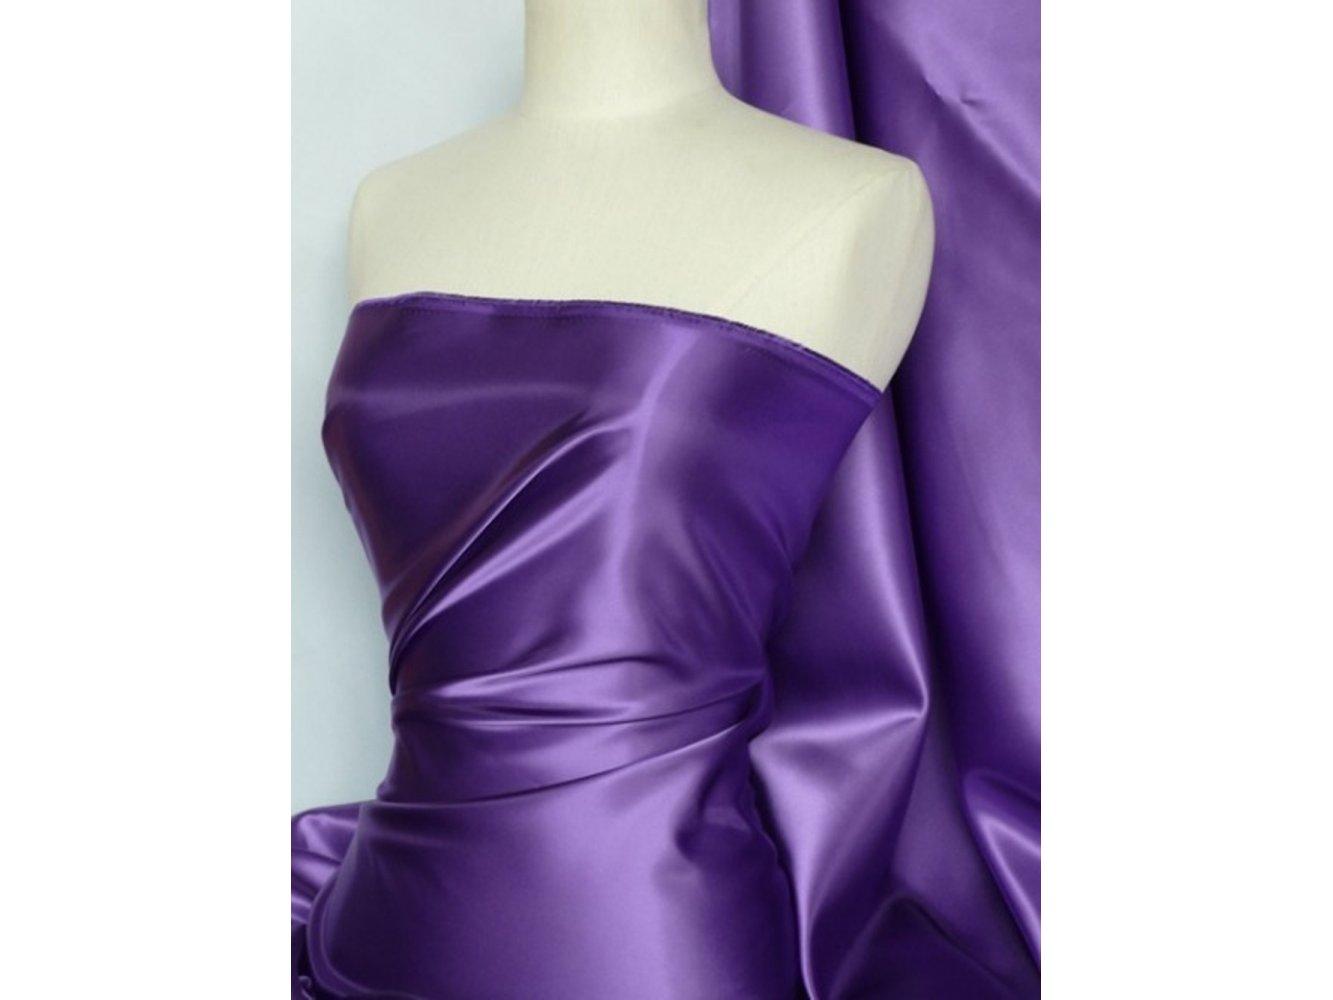 Acetate Clothing